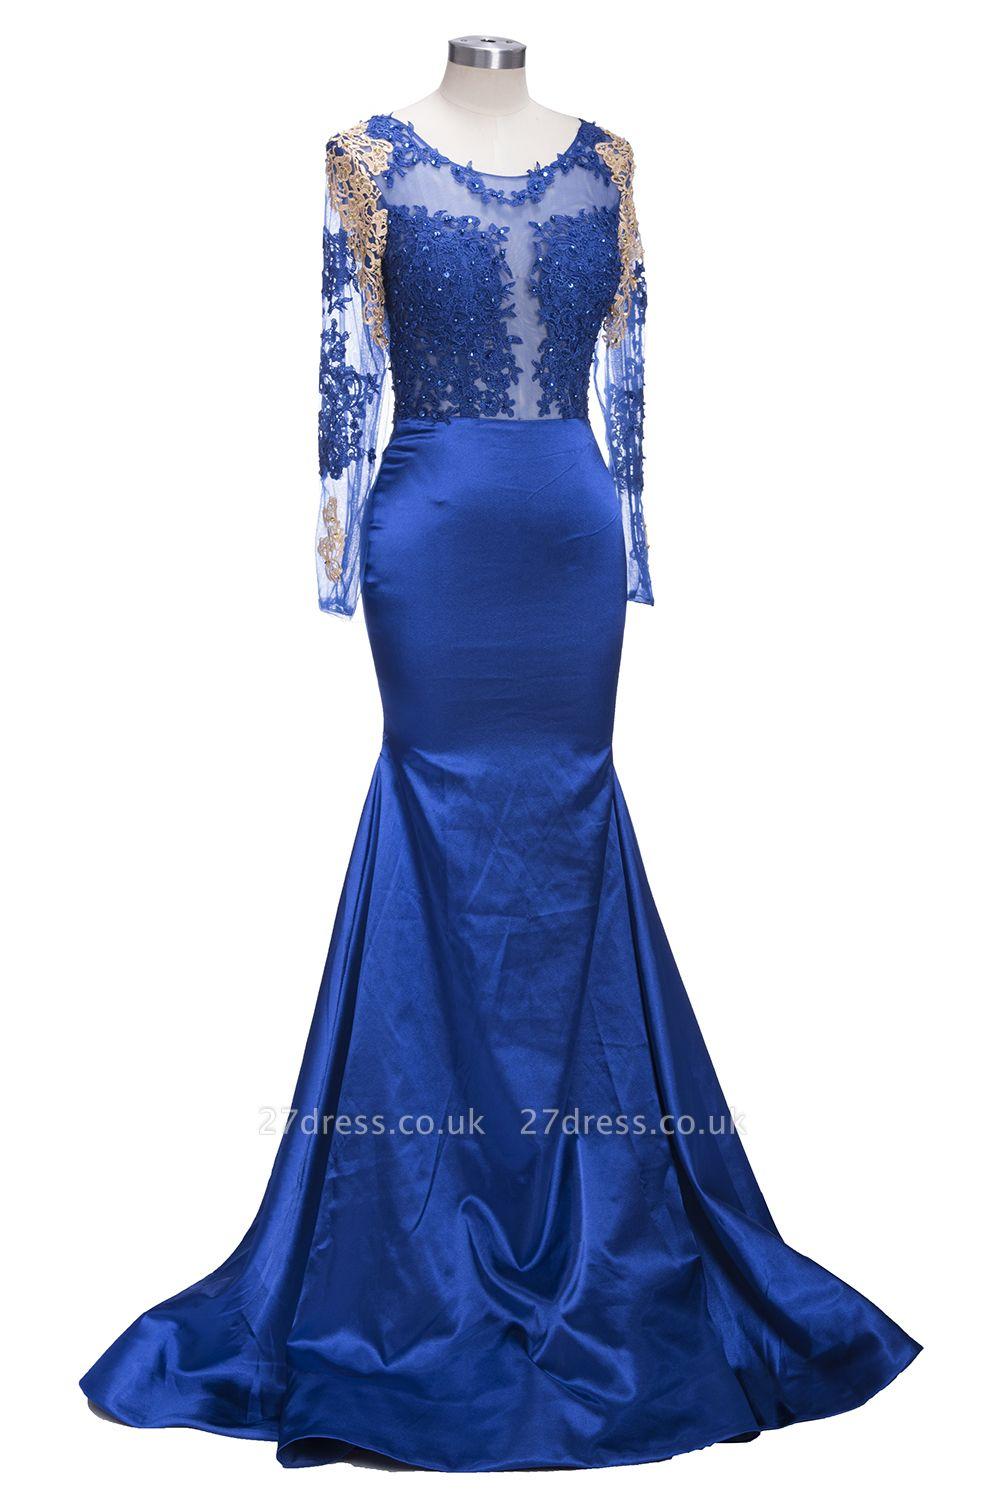 Long sleeve prom Dress UK, mermaid evening gowns